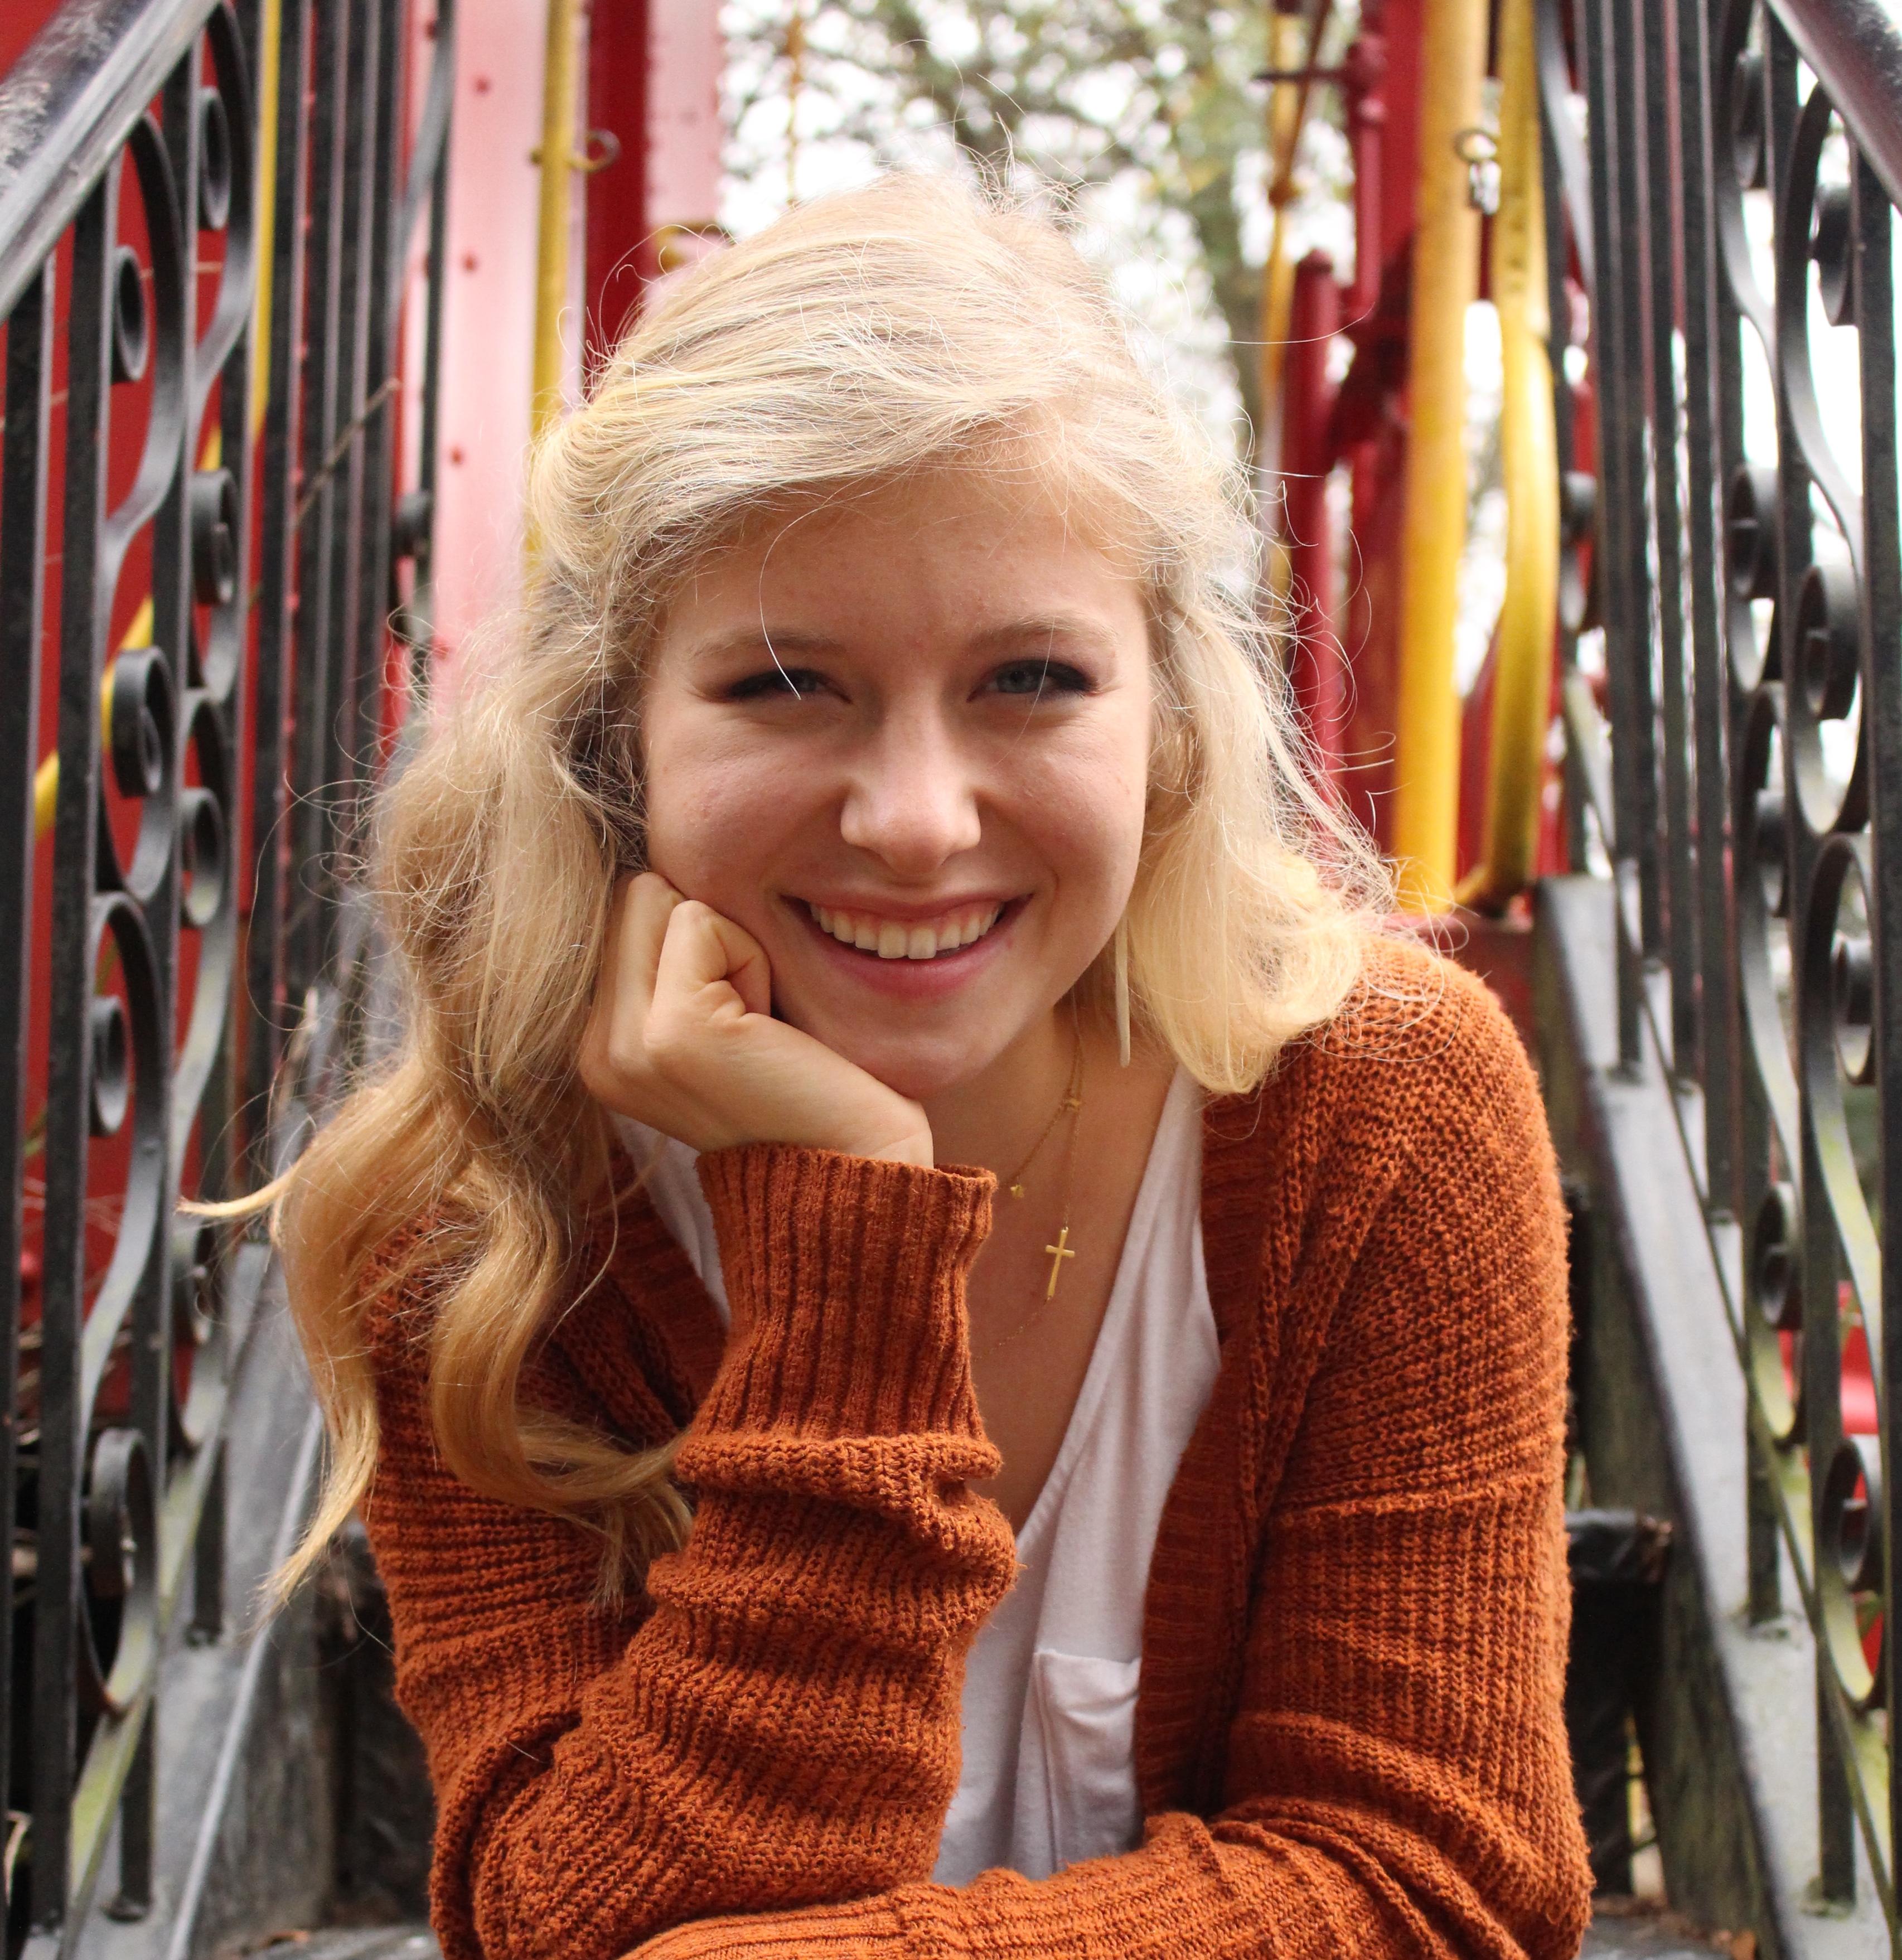 A photo of Clemson University Student, Ashley Crunk.